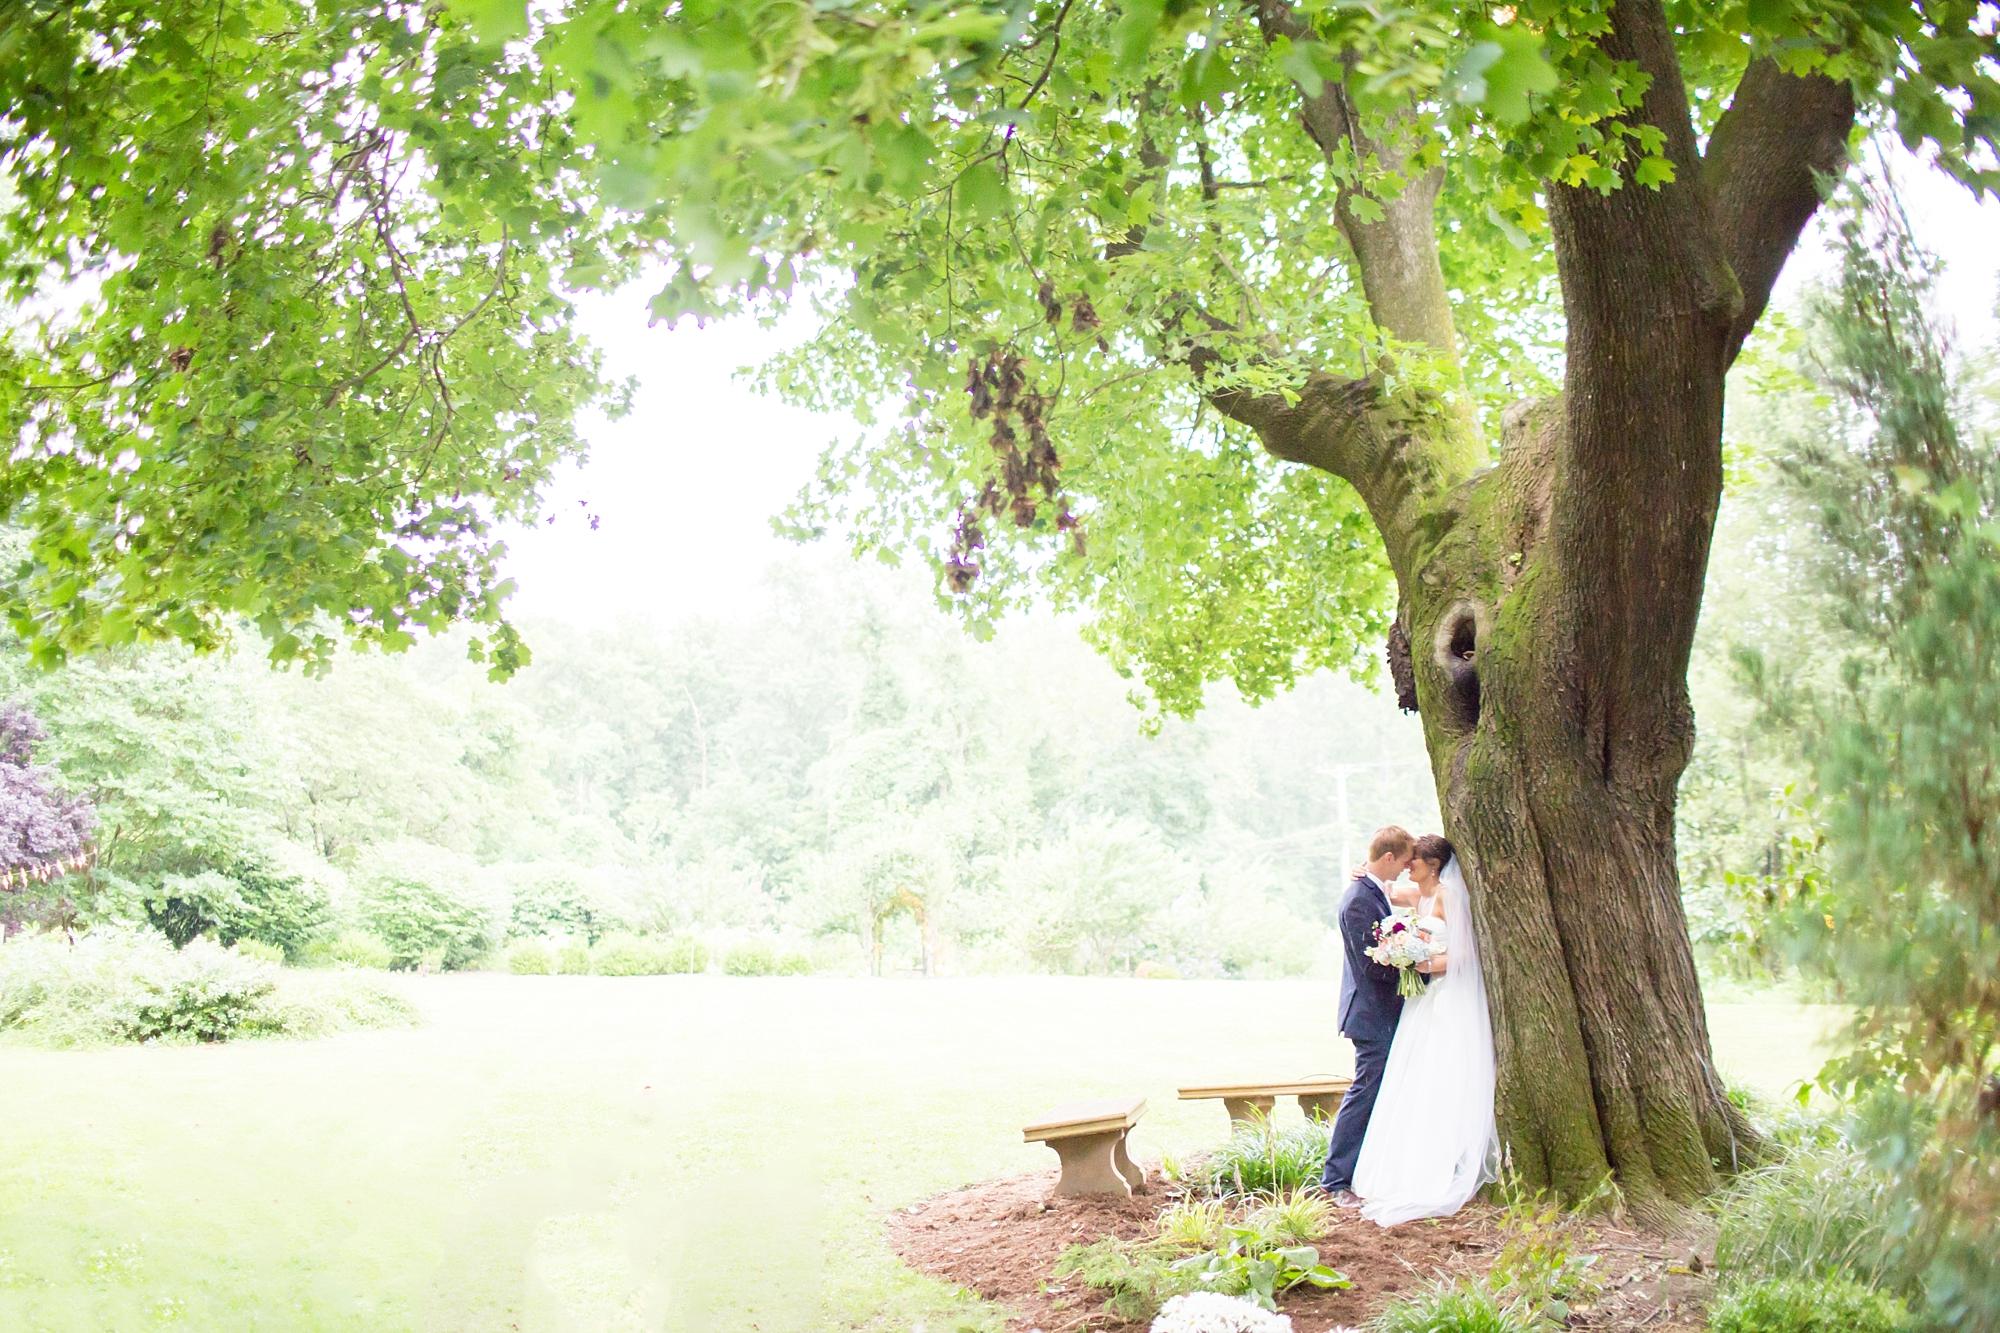 Russell 5-Bride & Groom Portraits-873_anna grace photography baltimore maryland wedding photographer elkridge furnace inn wedding photo.jpg